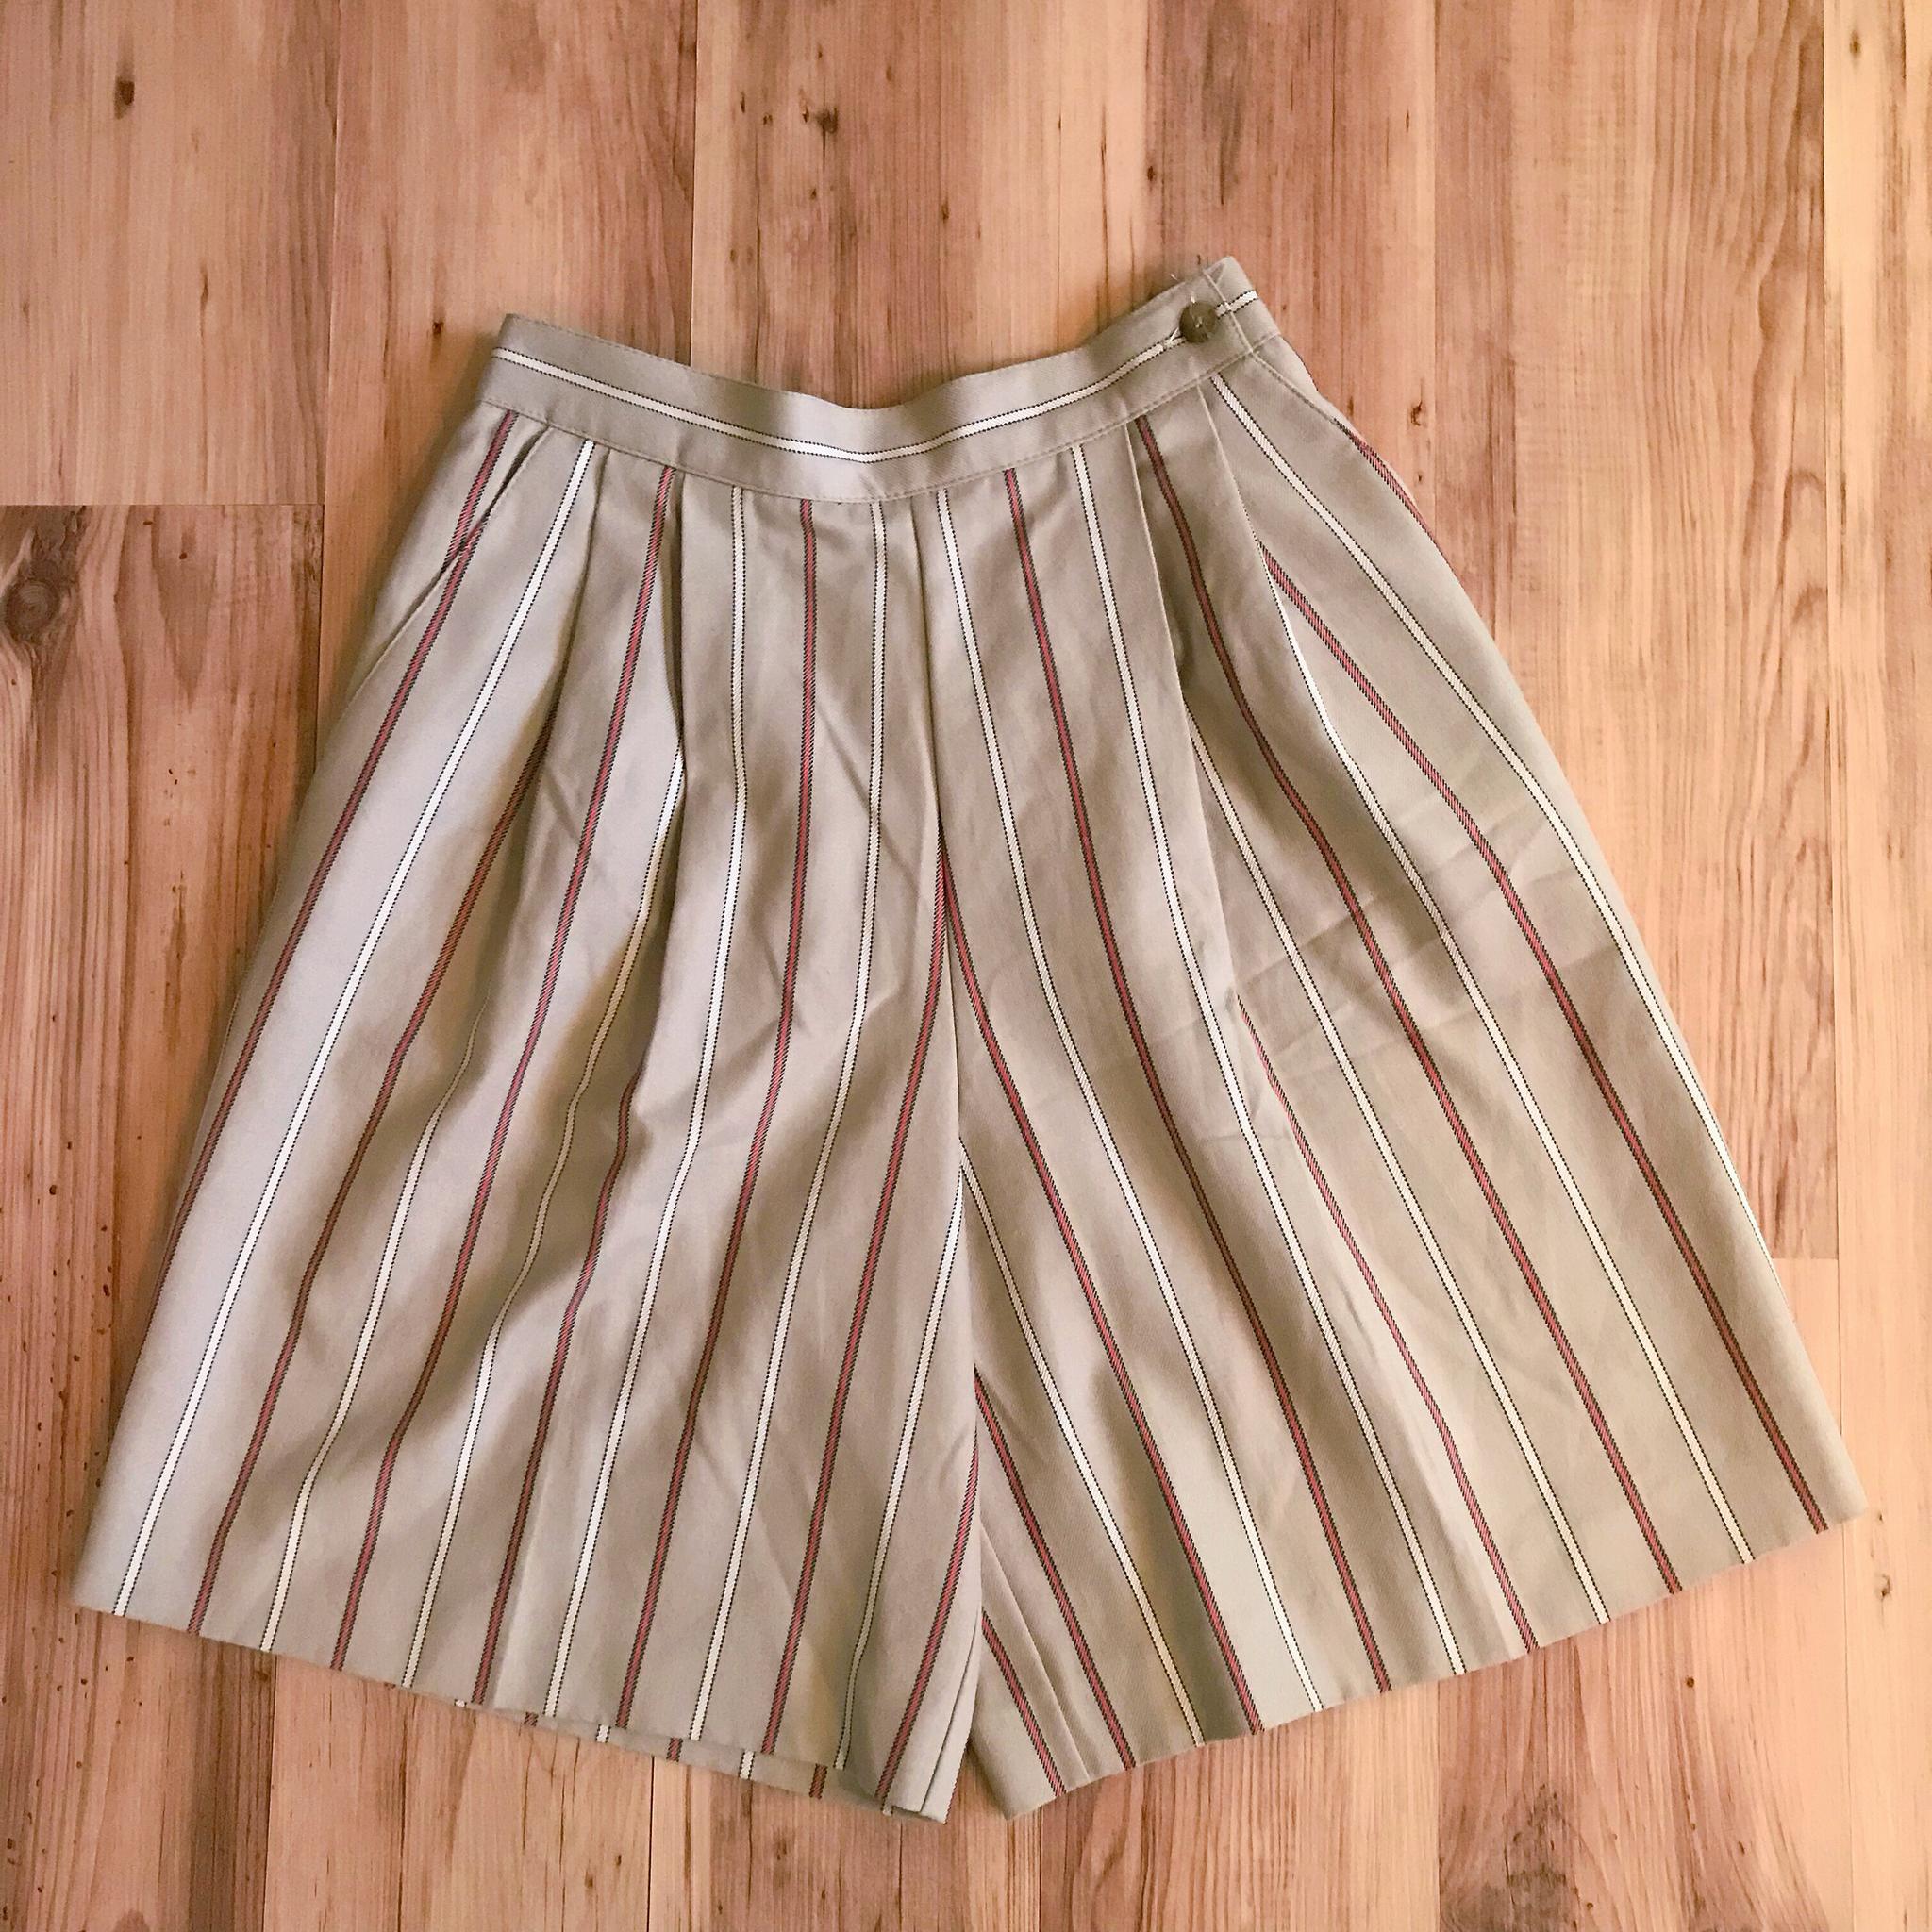 1980s Pinstriped Shorts